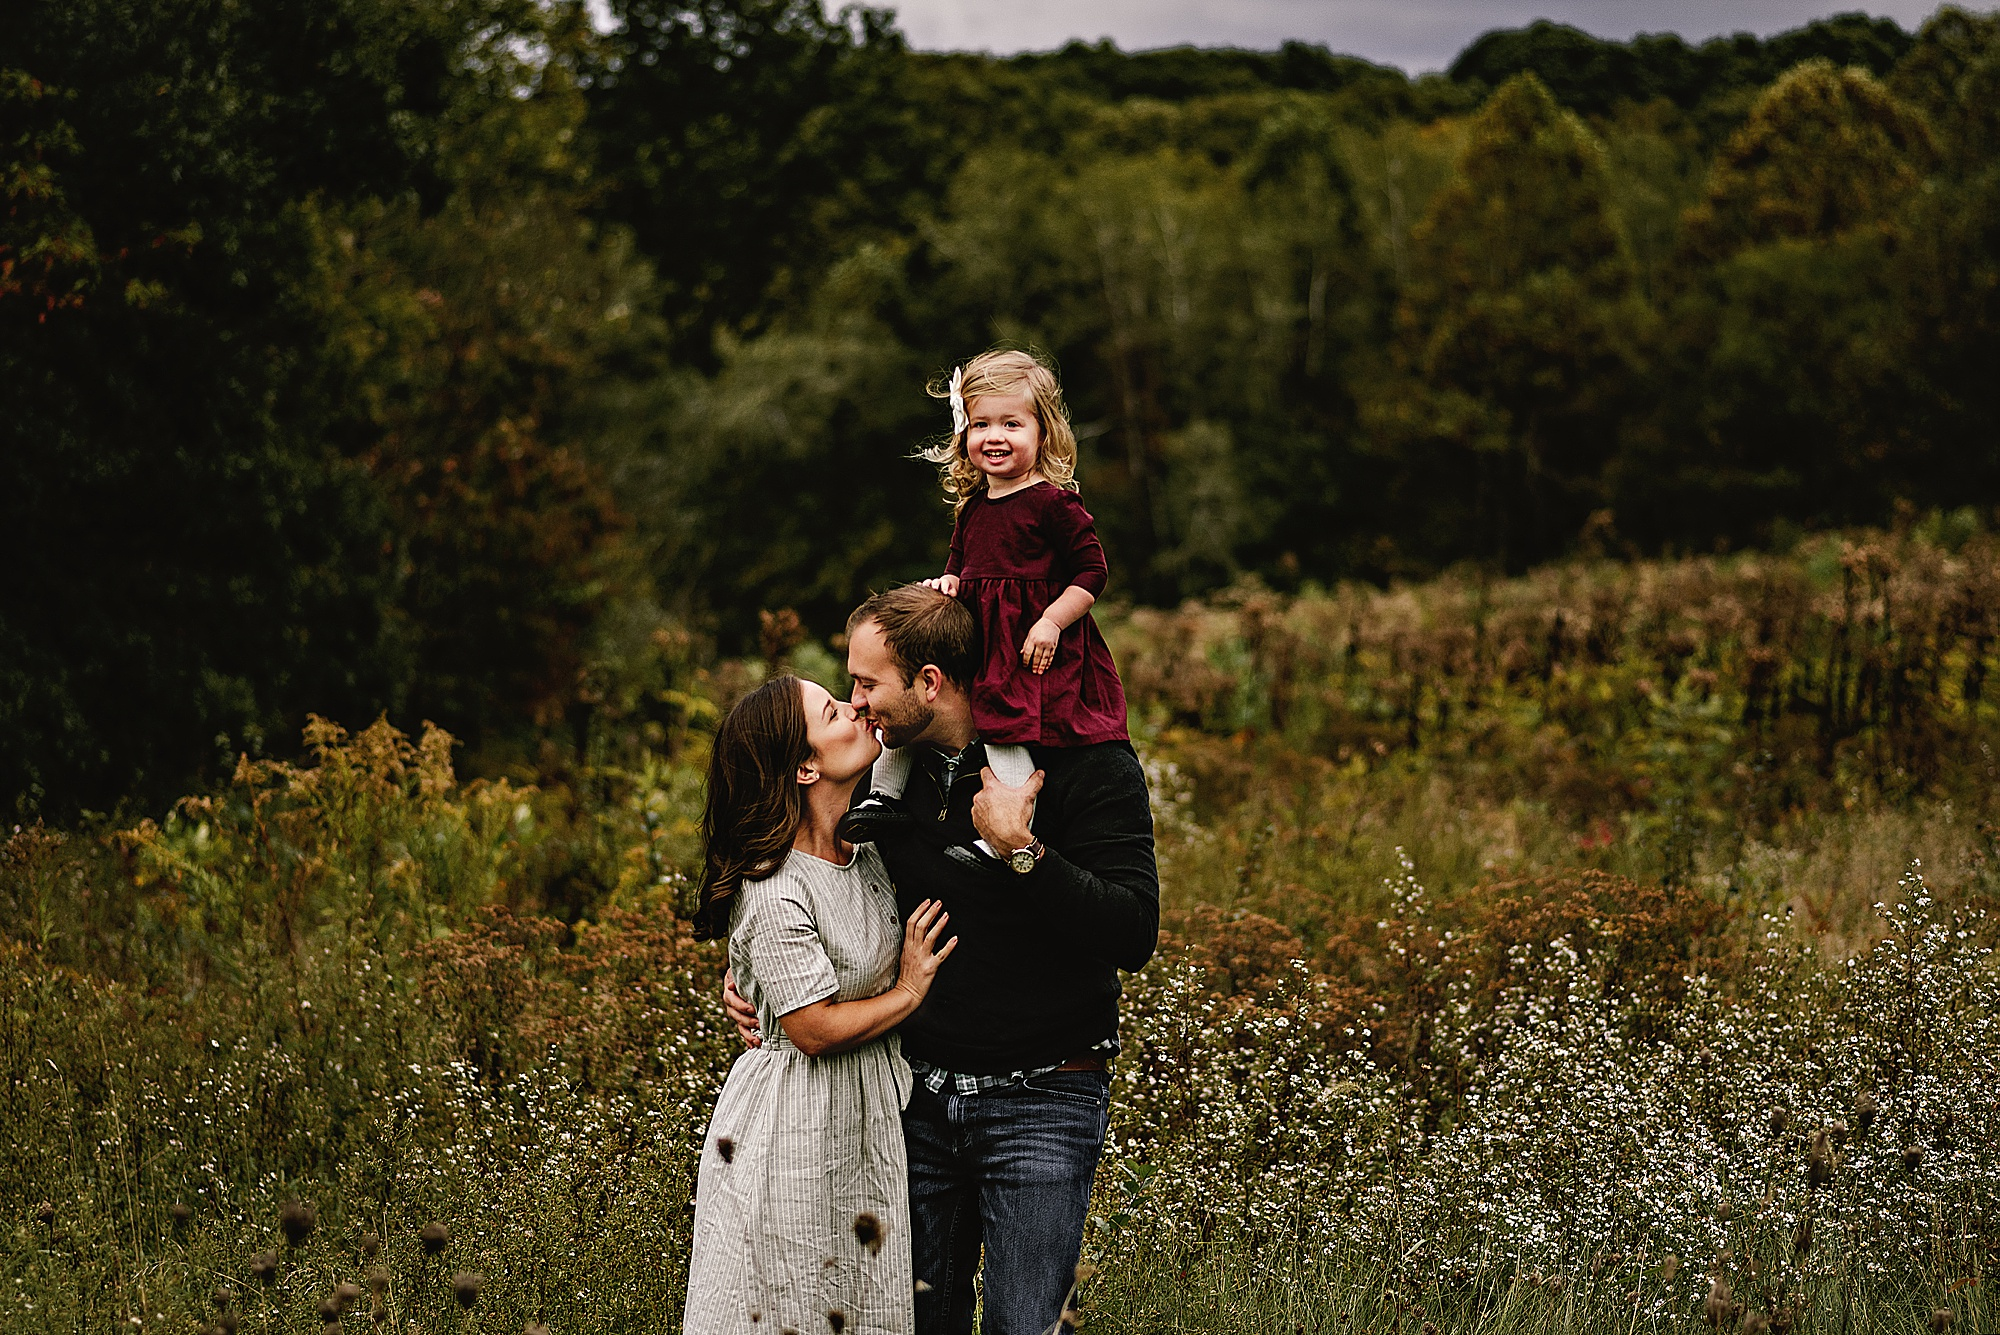 lauren-grayson-photography-akron-ohio-maternity-session-fall-hammer_0036.jpg